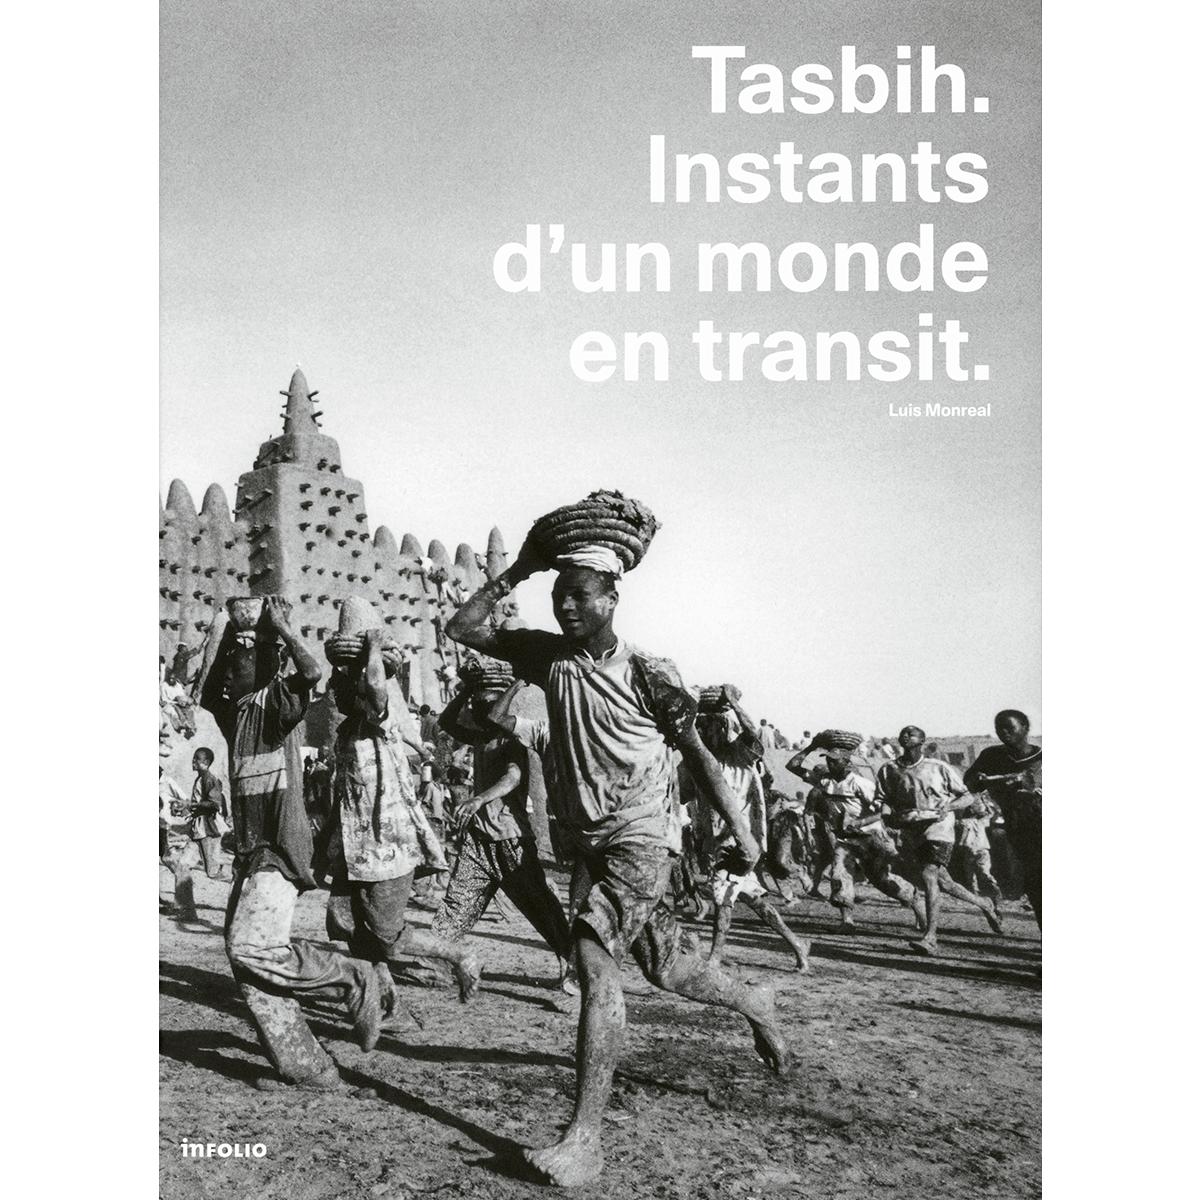 Tasbih. Instants d'un monde en transit